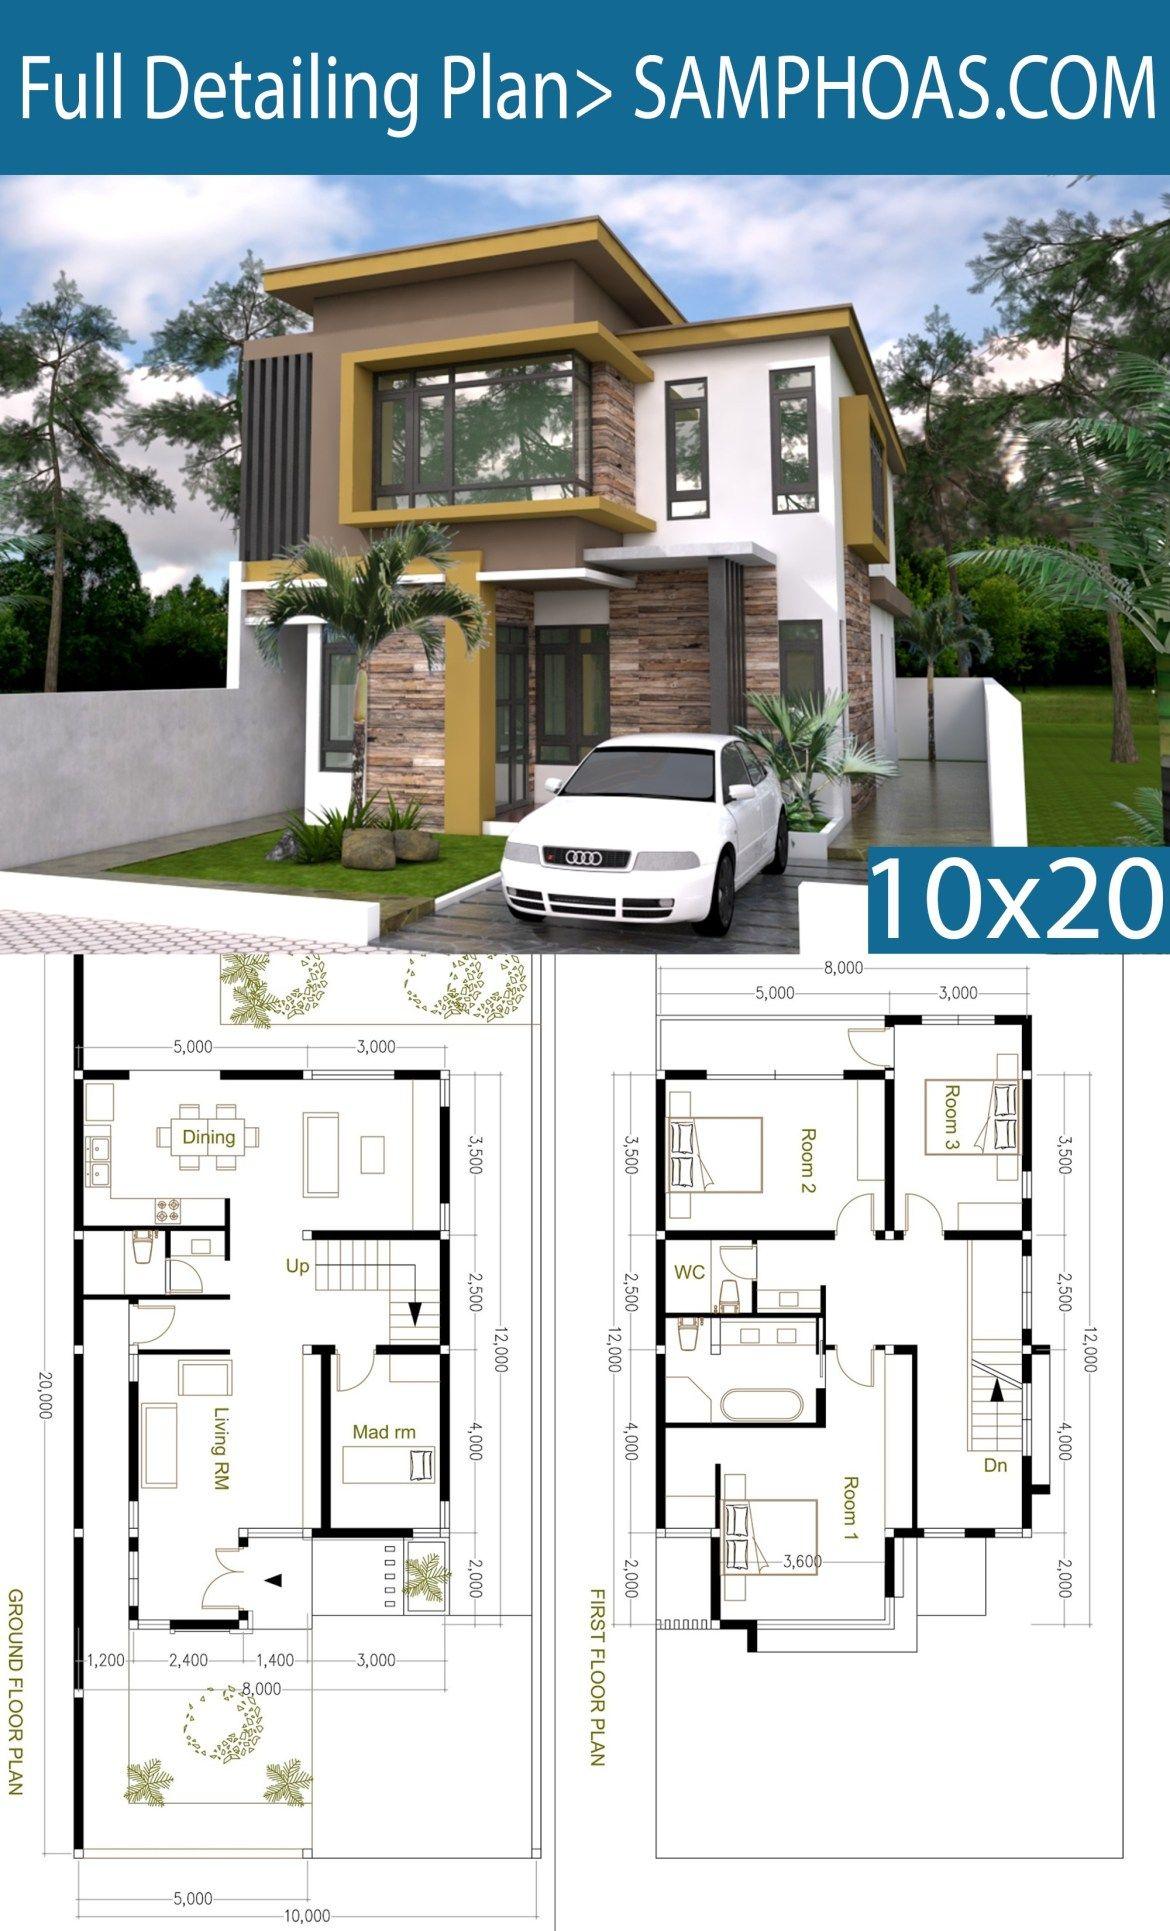 4 Bedroom Modern Home Plan Size 8x12m Samphoas Plansearch Dream House Plans House Designs Exterior House Plans